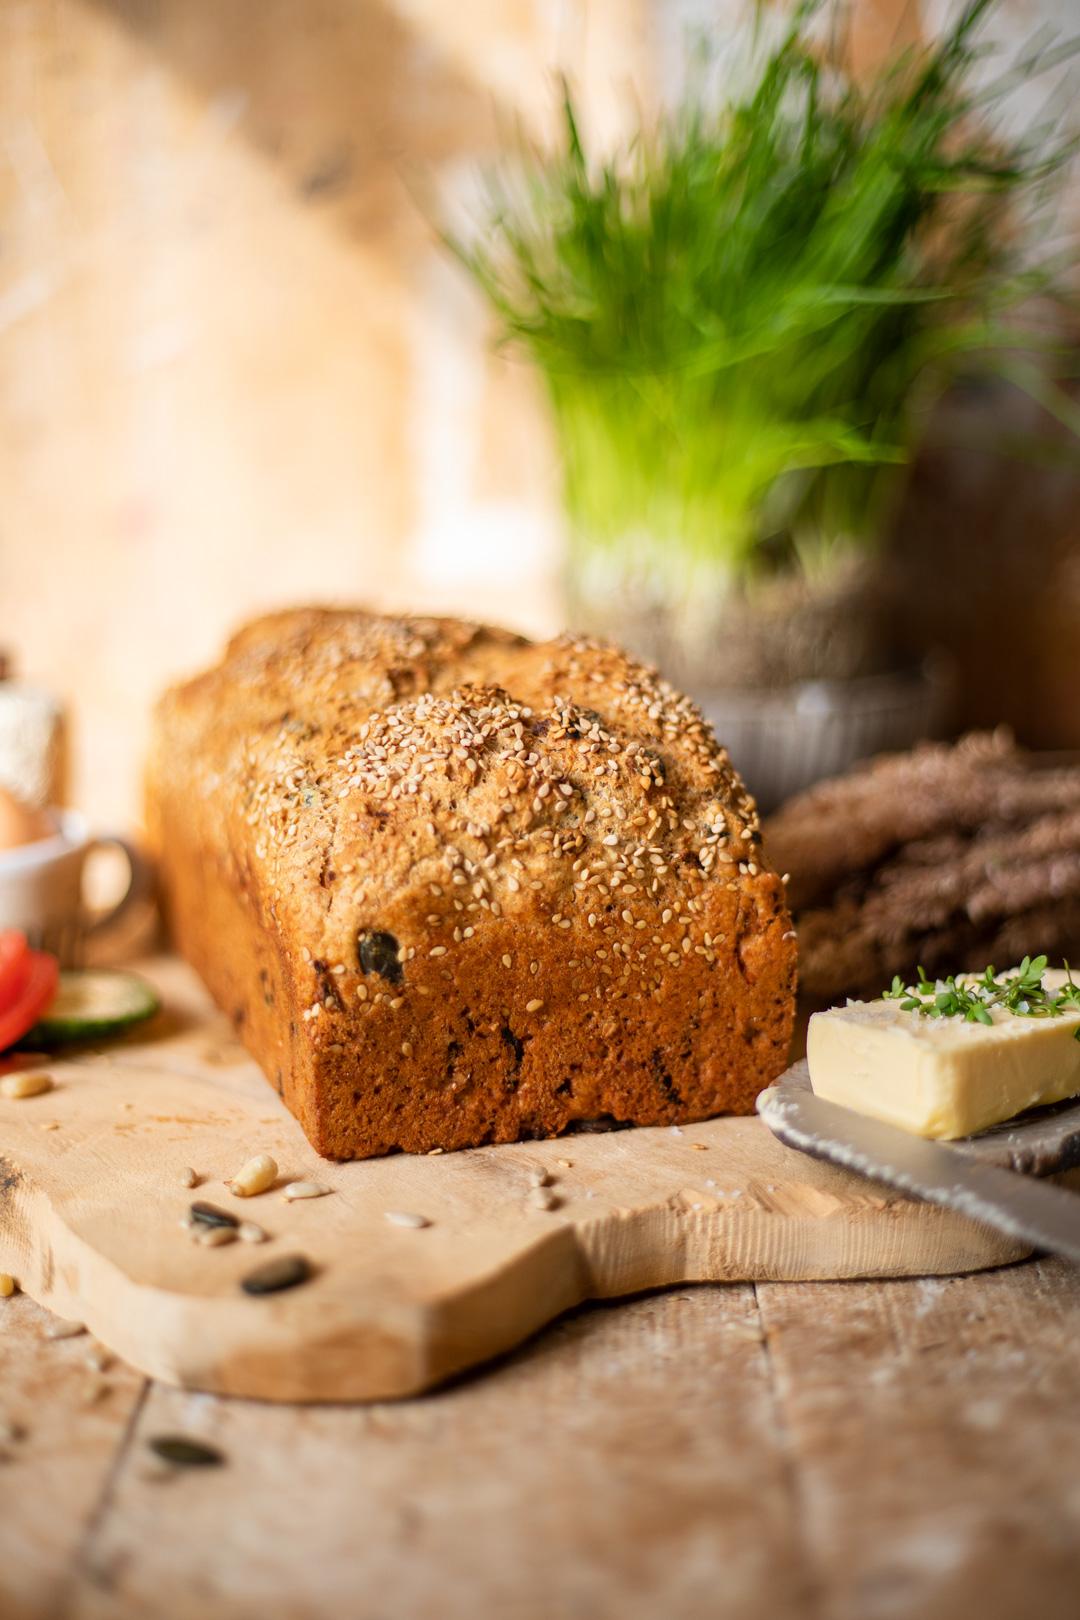 5-Minuten-Brot Rezept mit Hefe, Kernen und Saaten